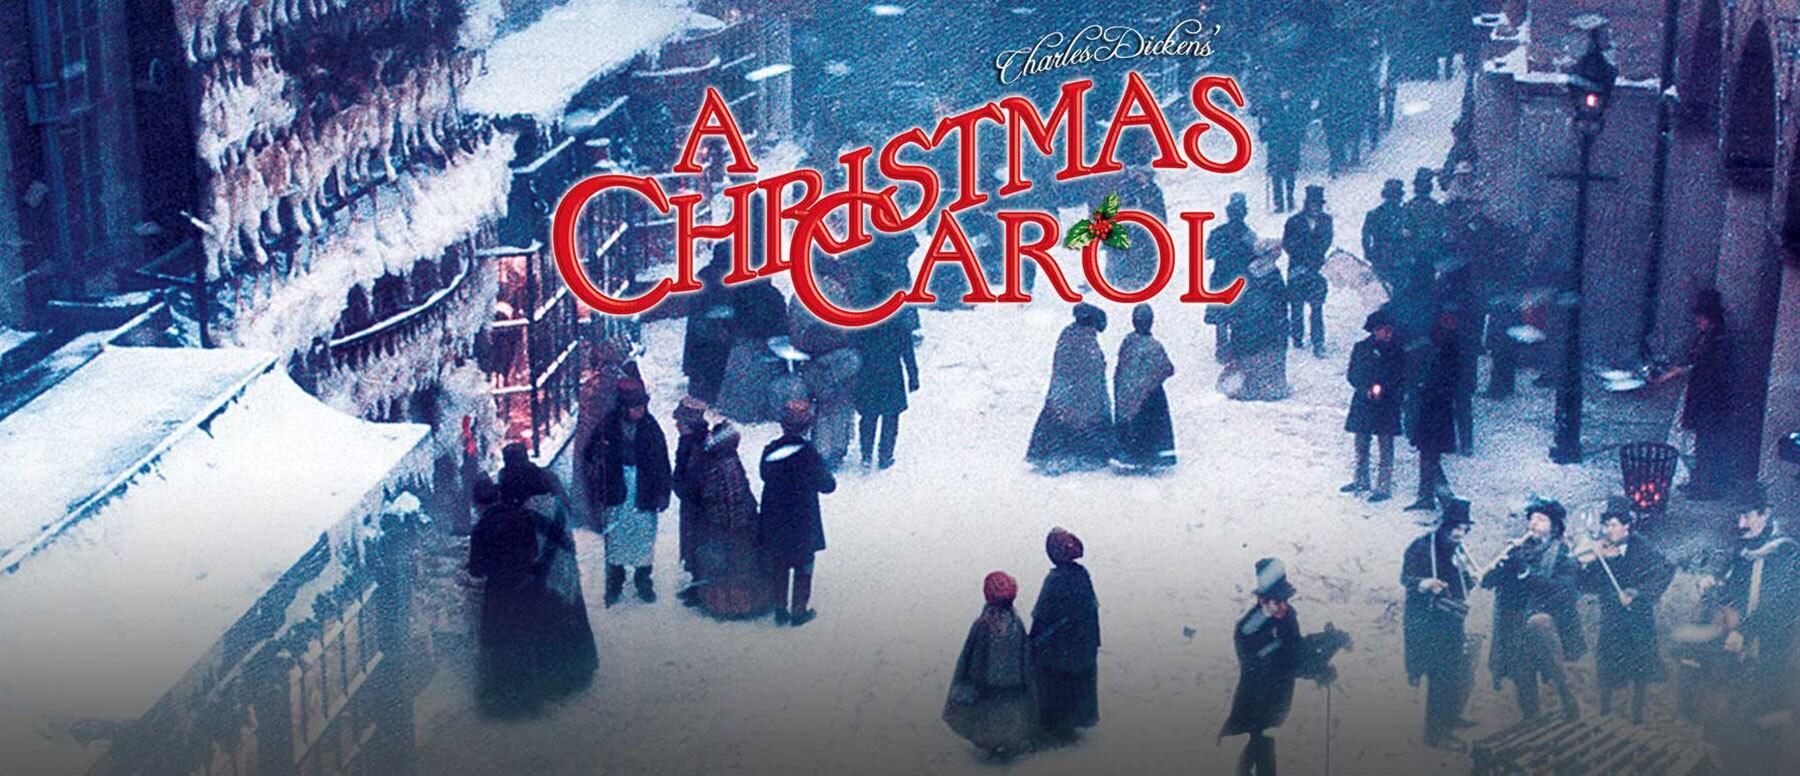 A Christmas Carol Hero